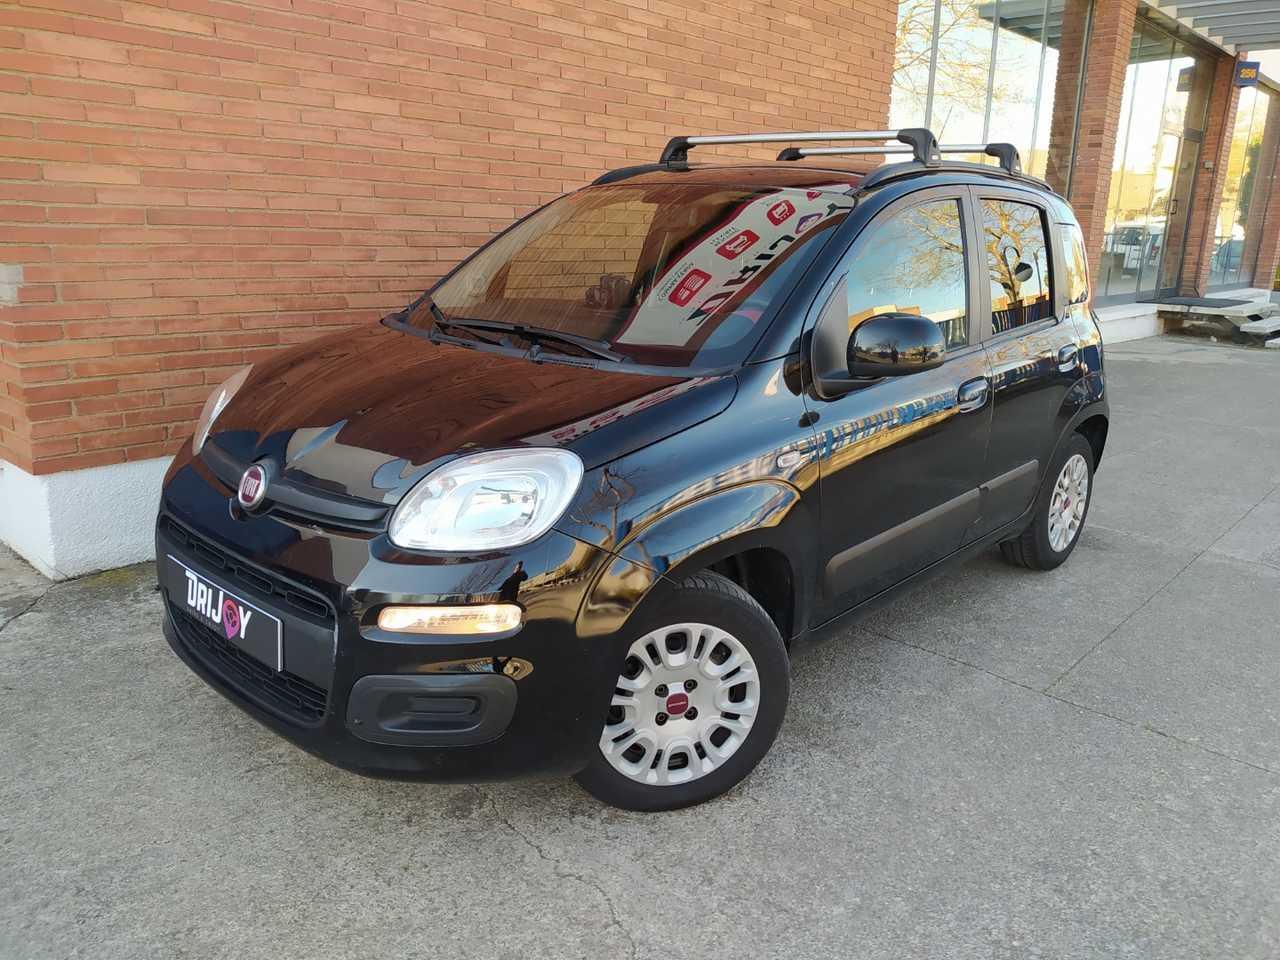 Fiat Panda 1.3 Lounge 75cv Diesel 5p.   - Foto 1